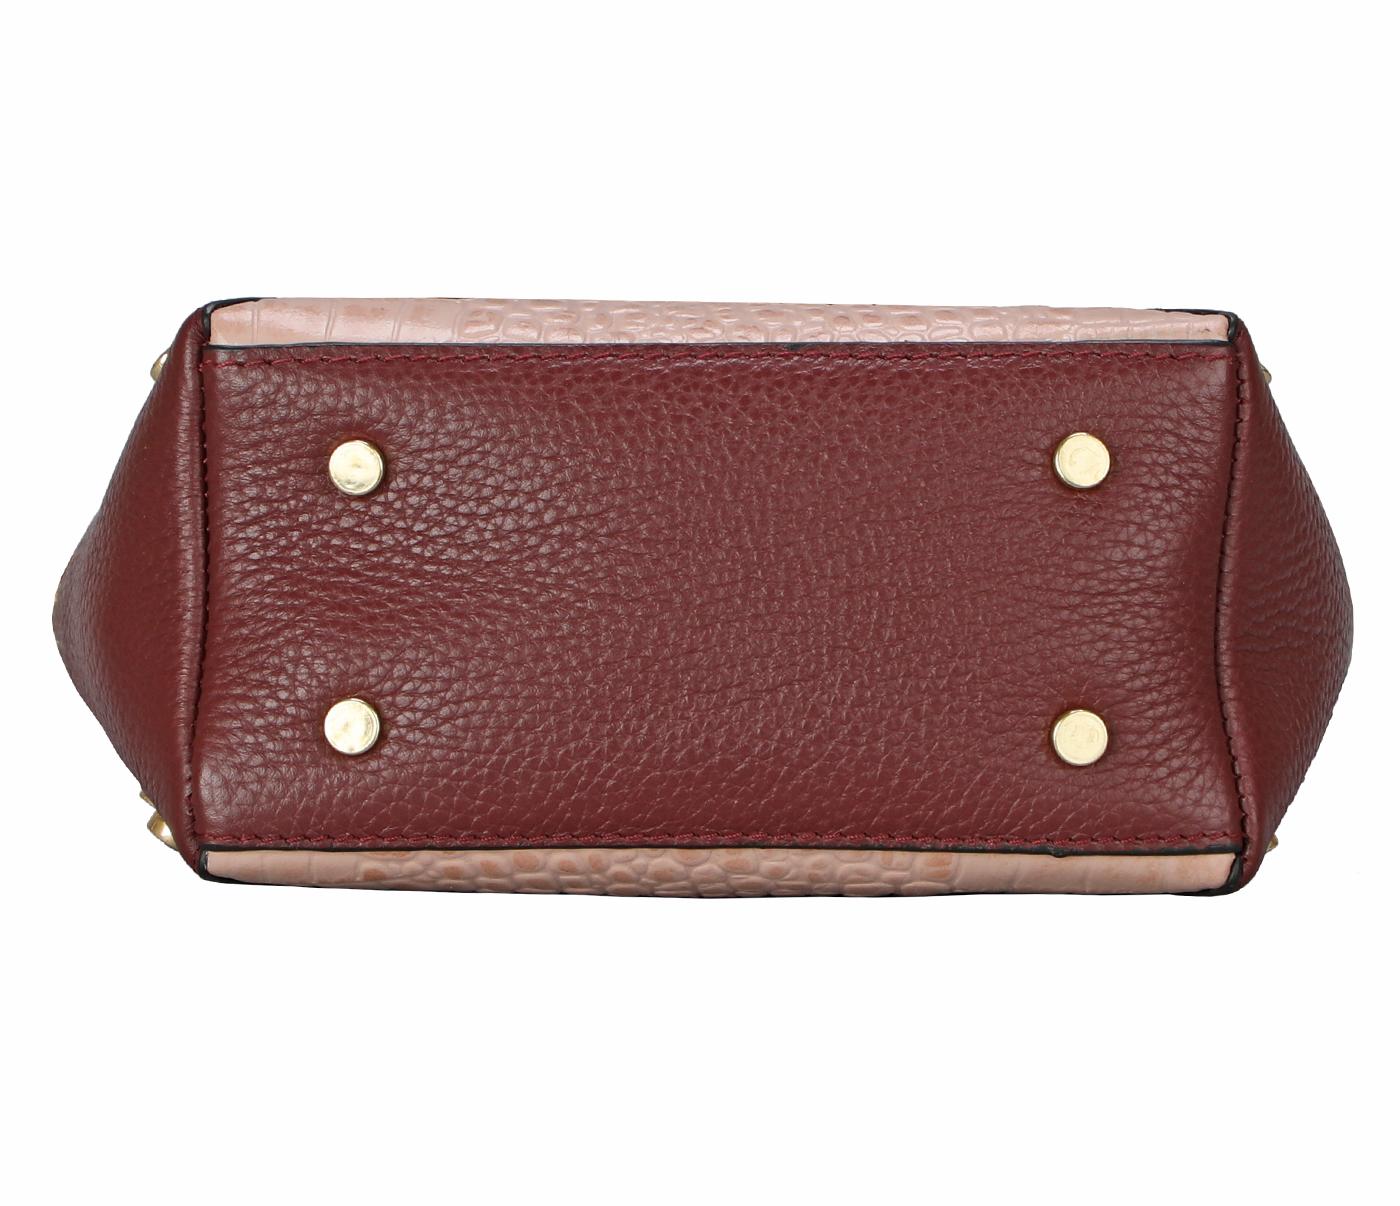 B876-Valencia-Shoulder work bag in Genuine Leather - Wine